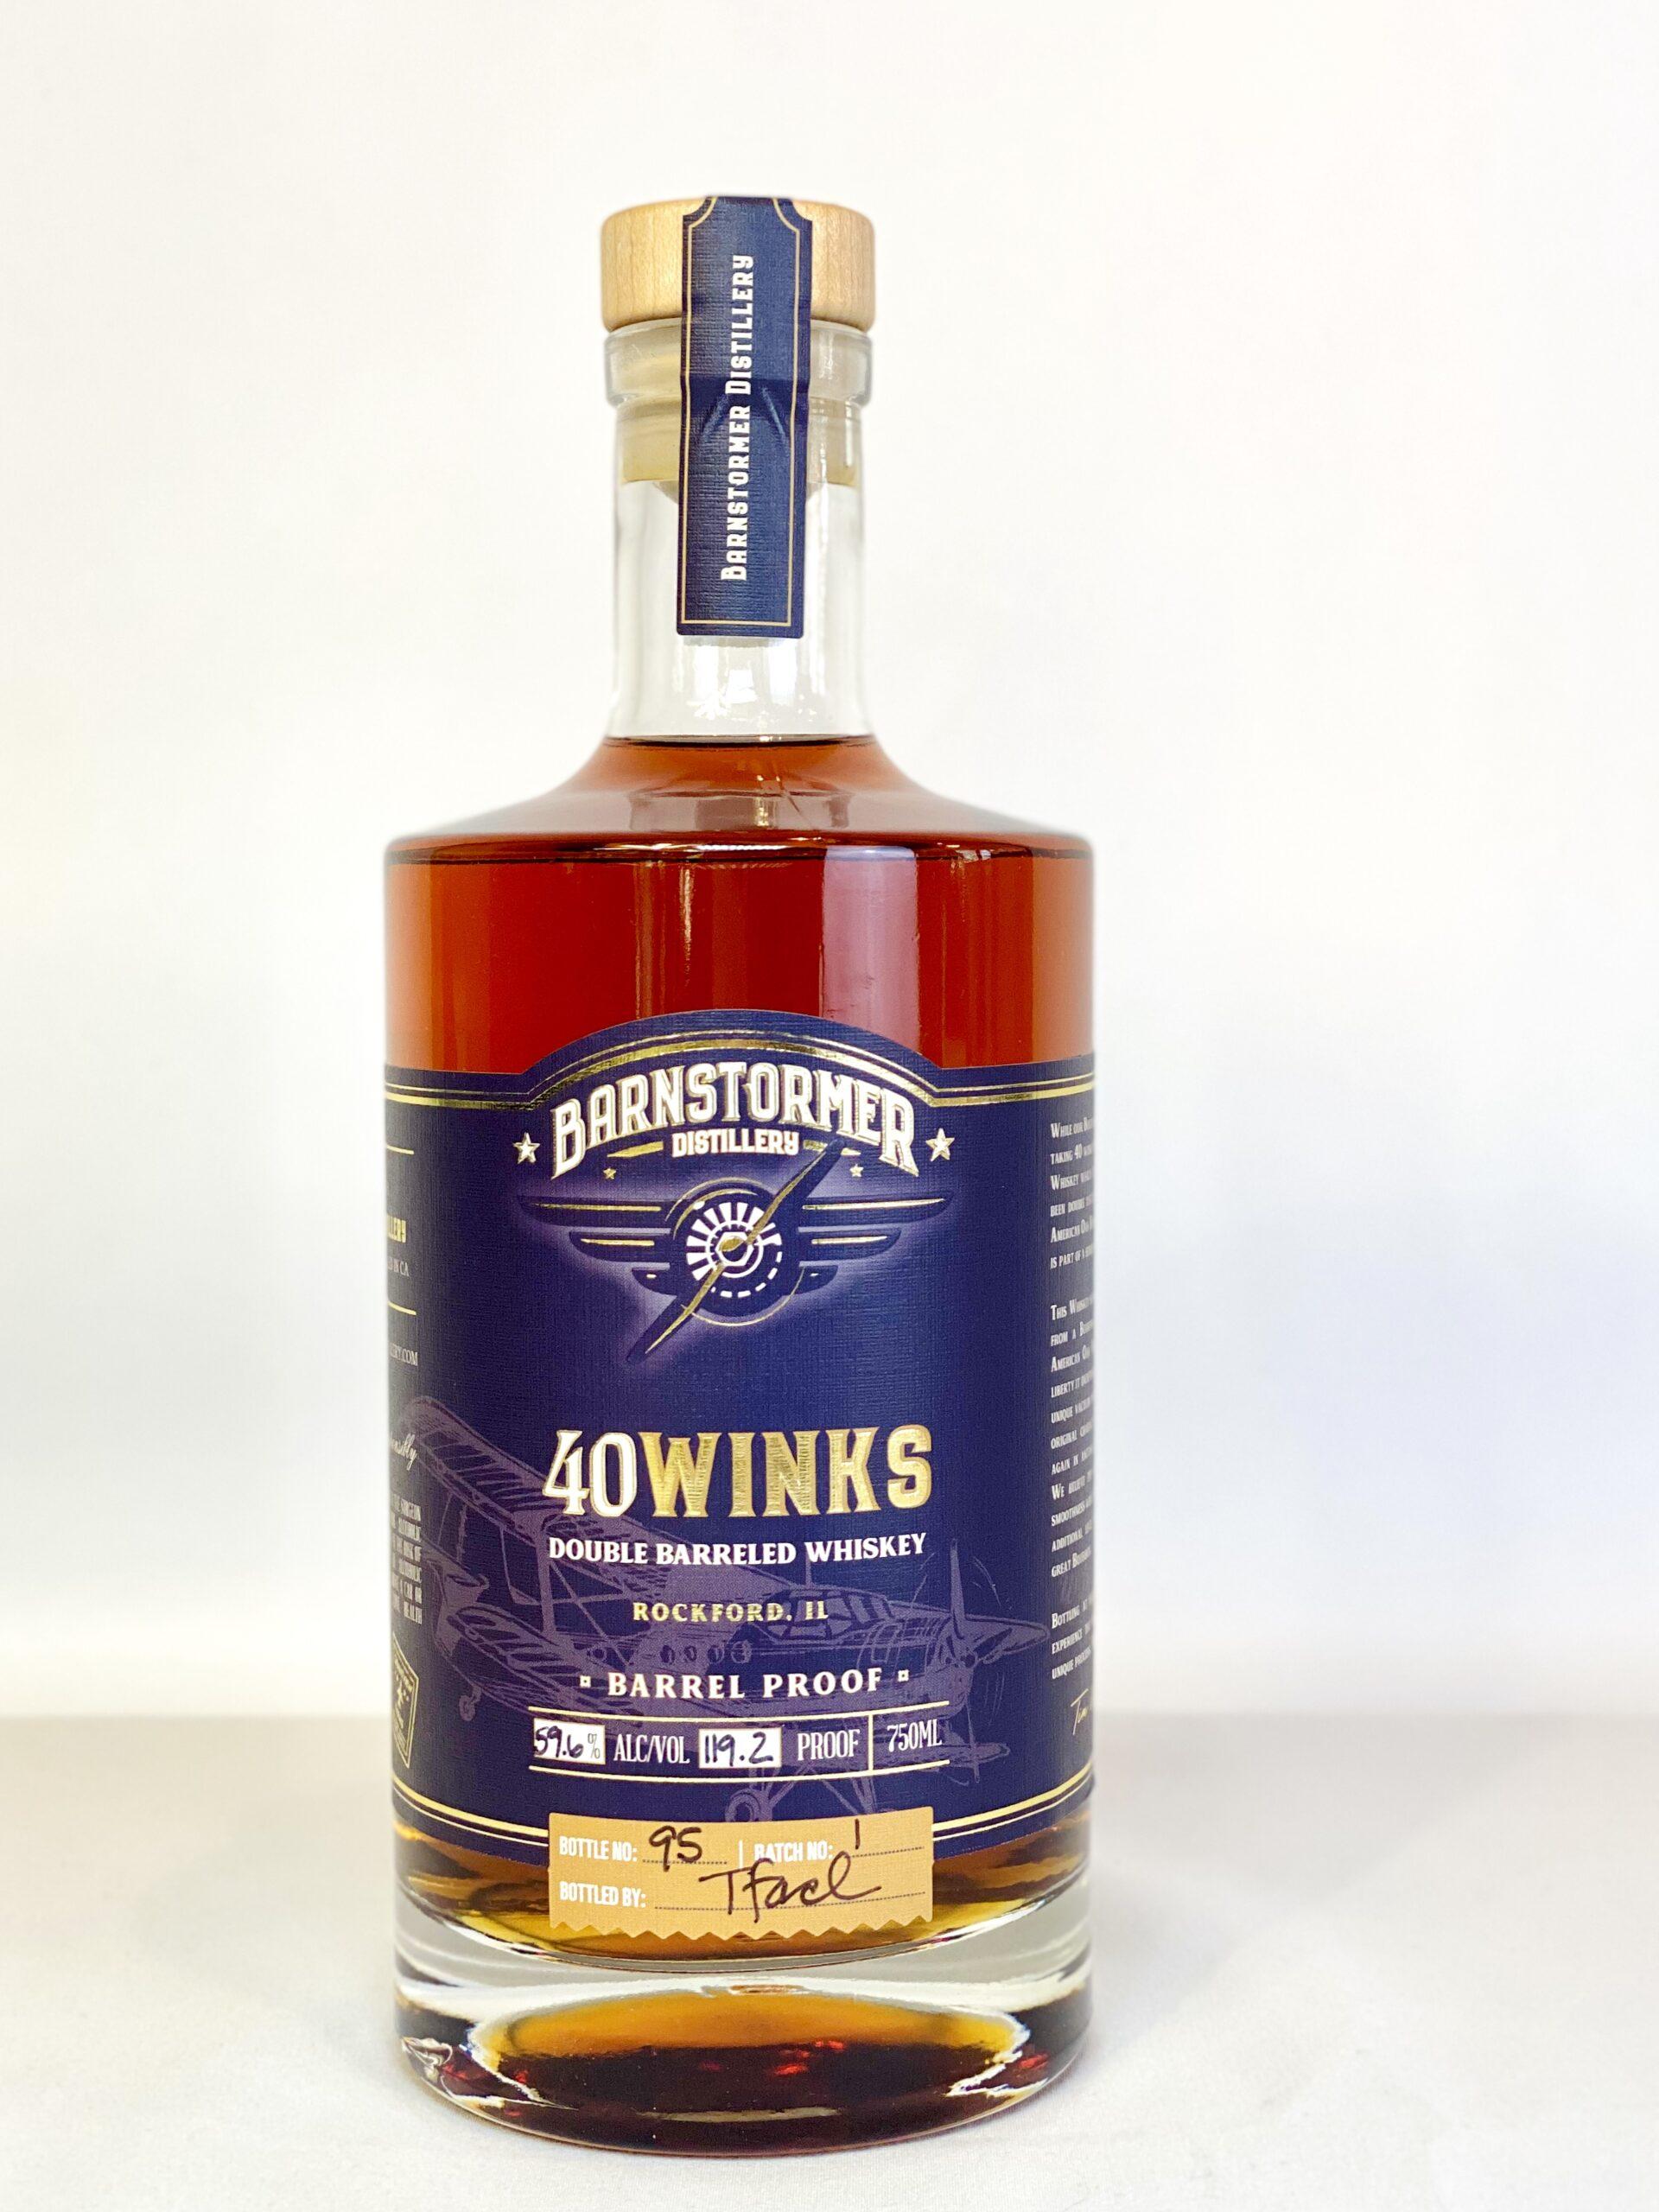 Barnstormer 40 Winks Whiskey Barrel Proof